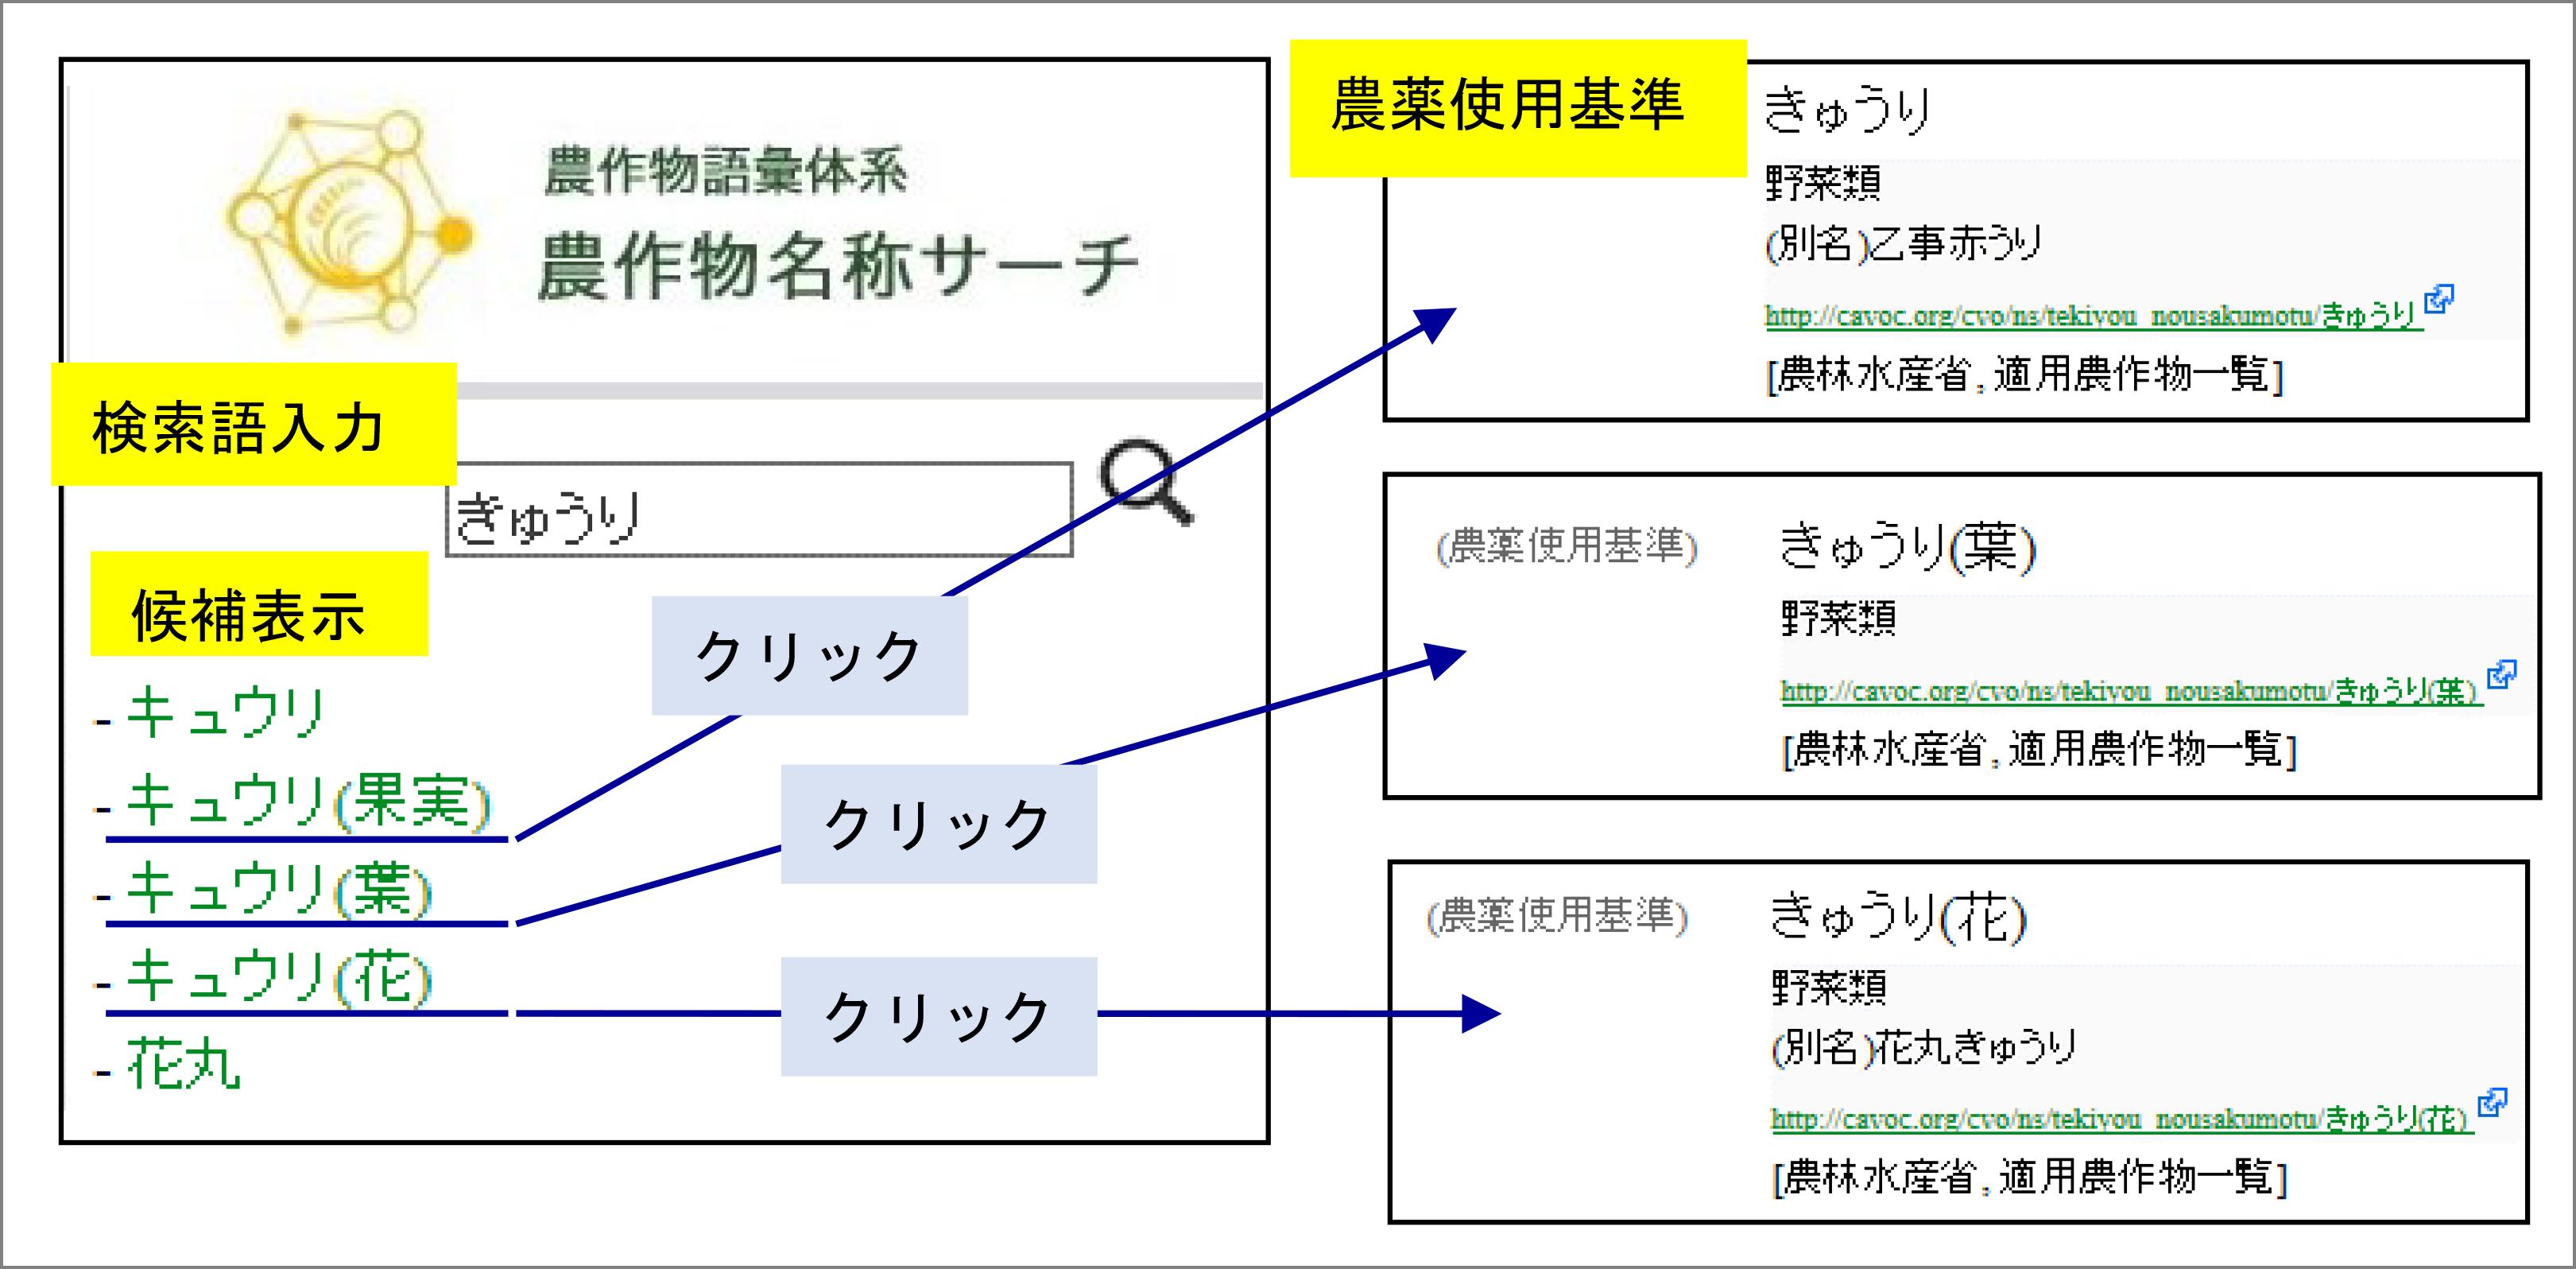 nii_newsrelease_20190403_image2.png